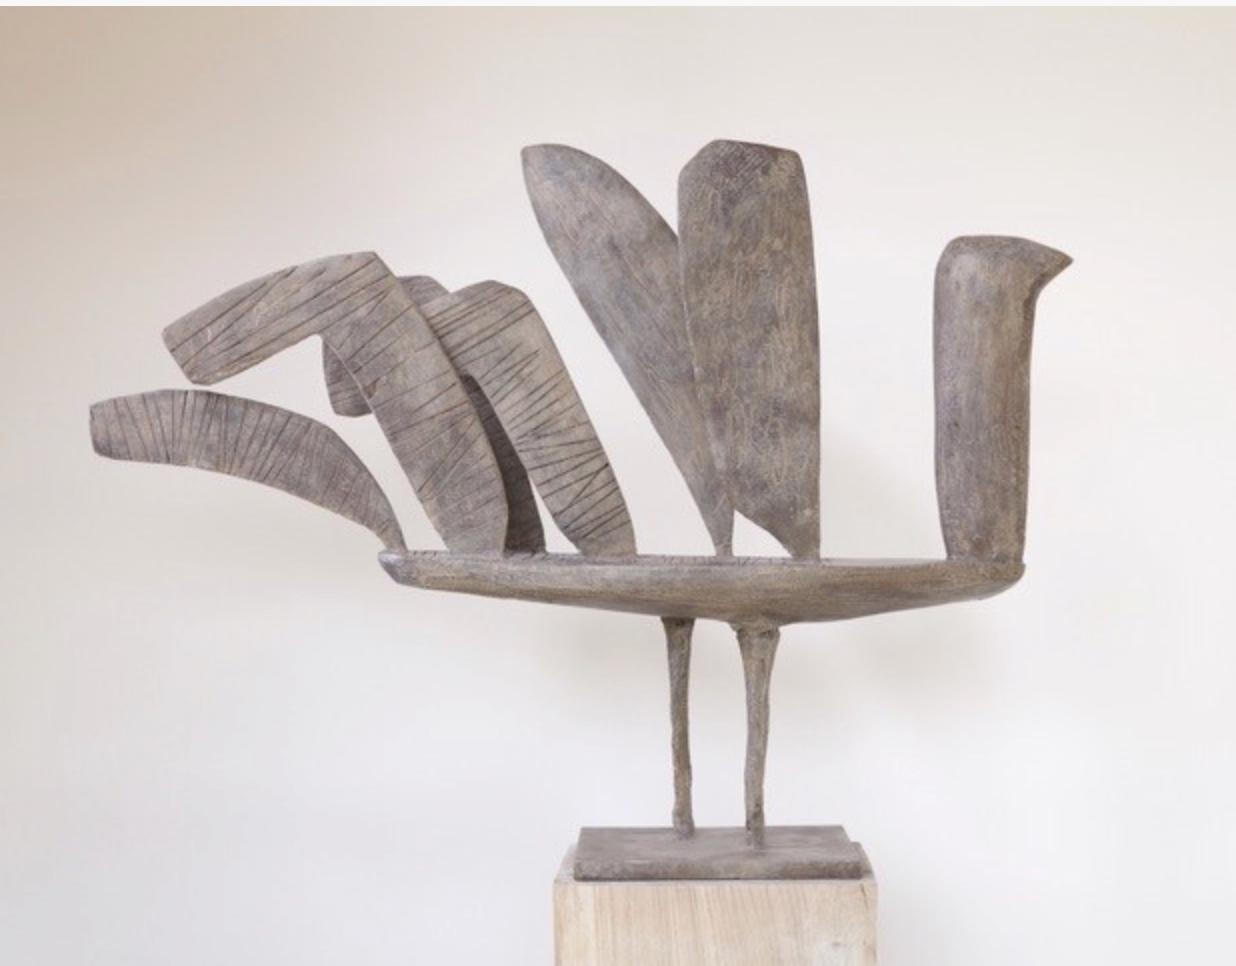 Barcelona Bird Bronze Ed V 64 x 84 x 25 x 17 cm